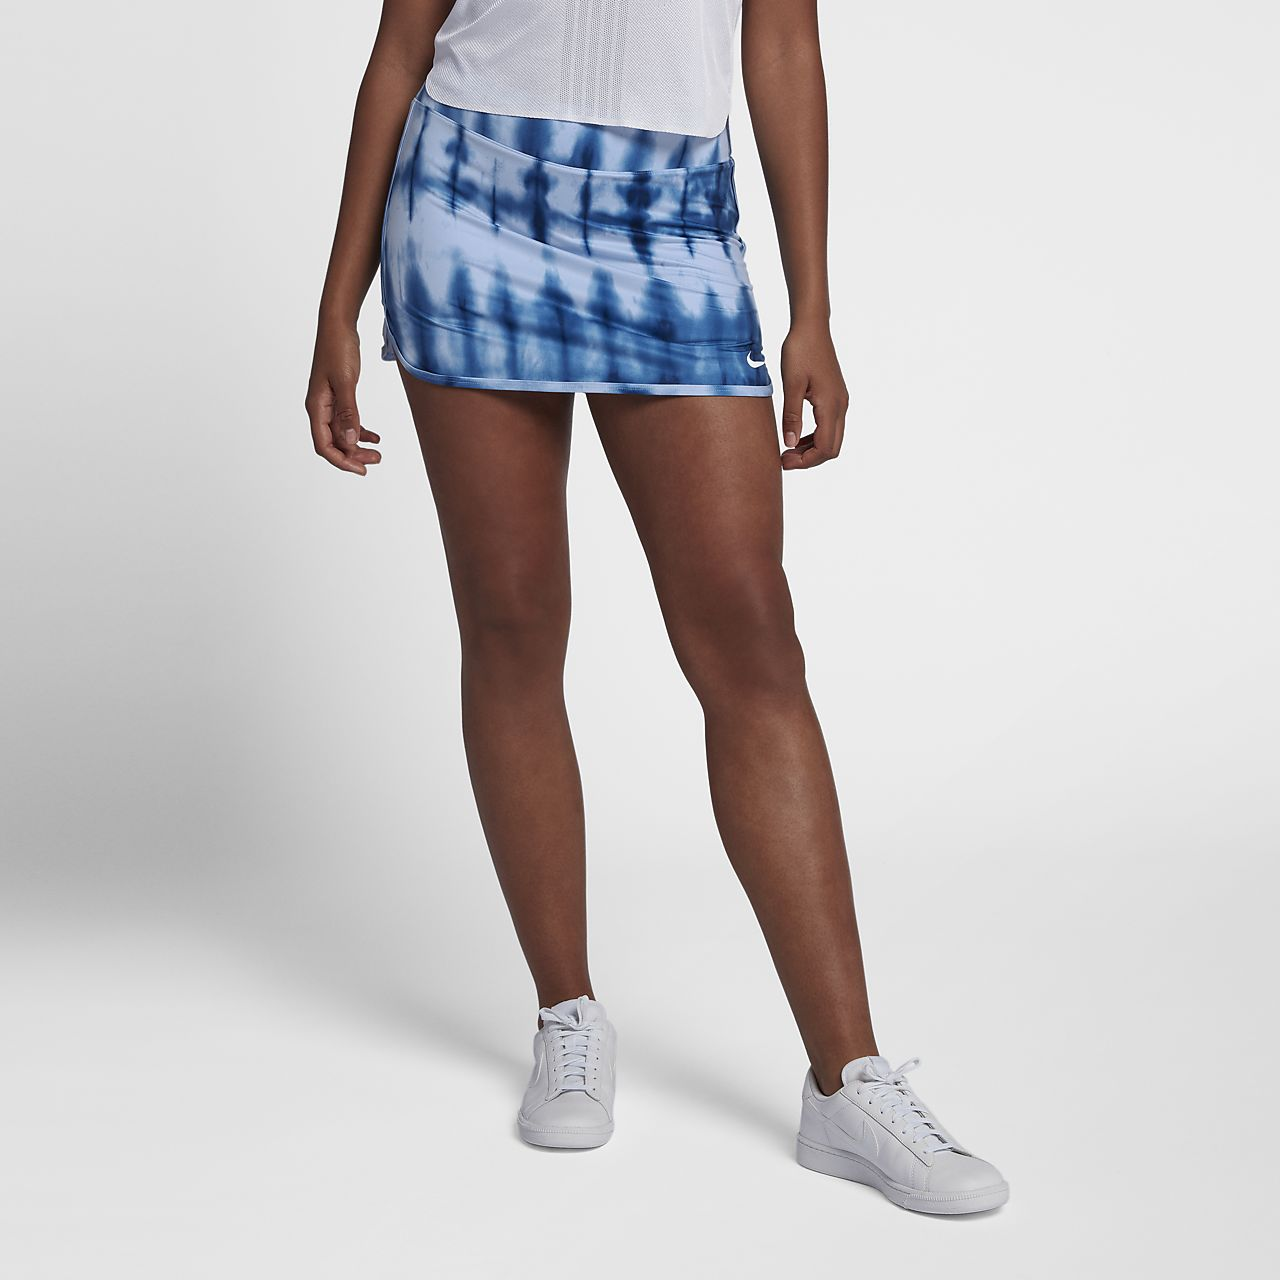 Gonna da tennis NikeCourt Pure - Donna